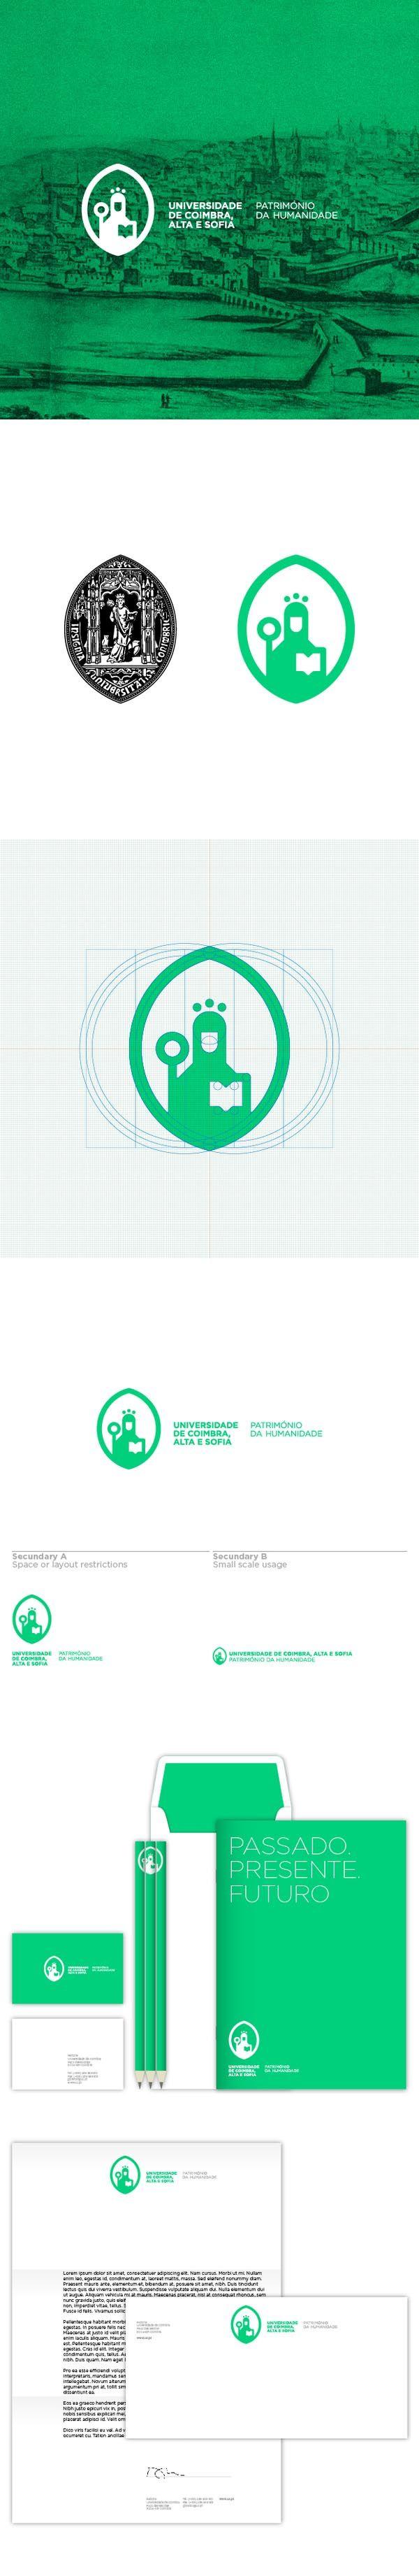 Universidade De Coimbra   #stationary #corporate #design #corporatedesign #logo #identity < < repinned by www.BlickeDeeler.de   Follow us on www.facebook.com/BlickeDeeler